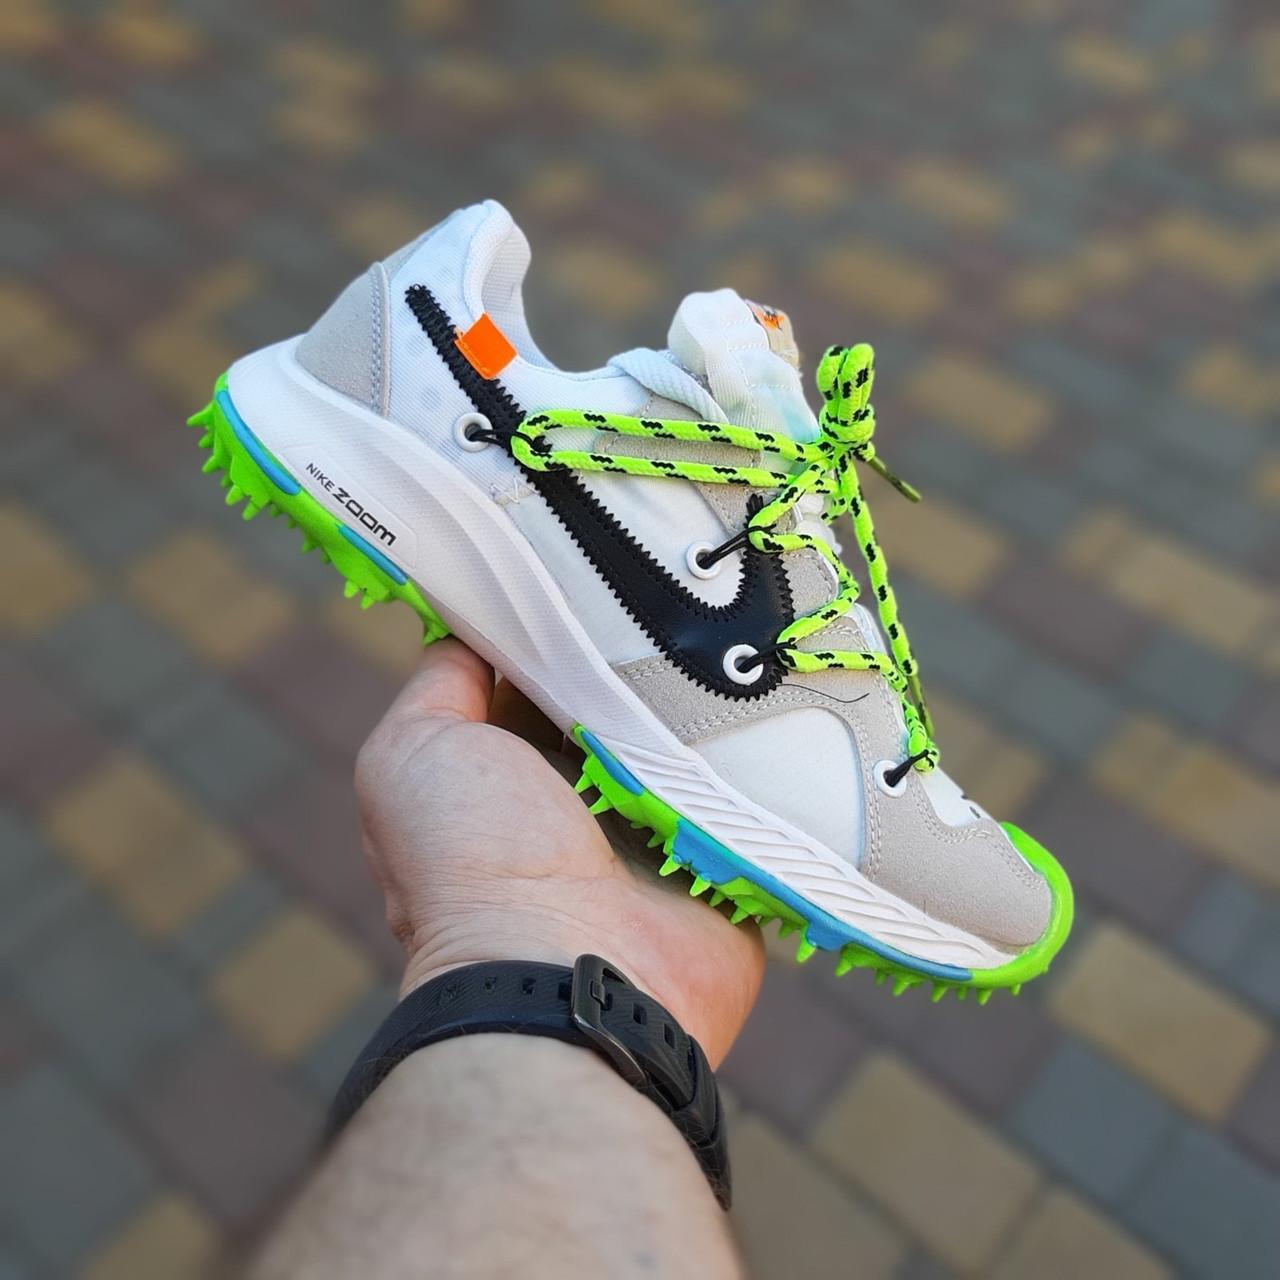 Кроссовки распродажа АКЦИЯ последние размеры Nike Zoom Terra Kiger 650 грн  люкс копия